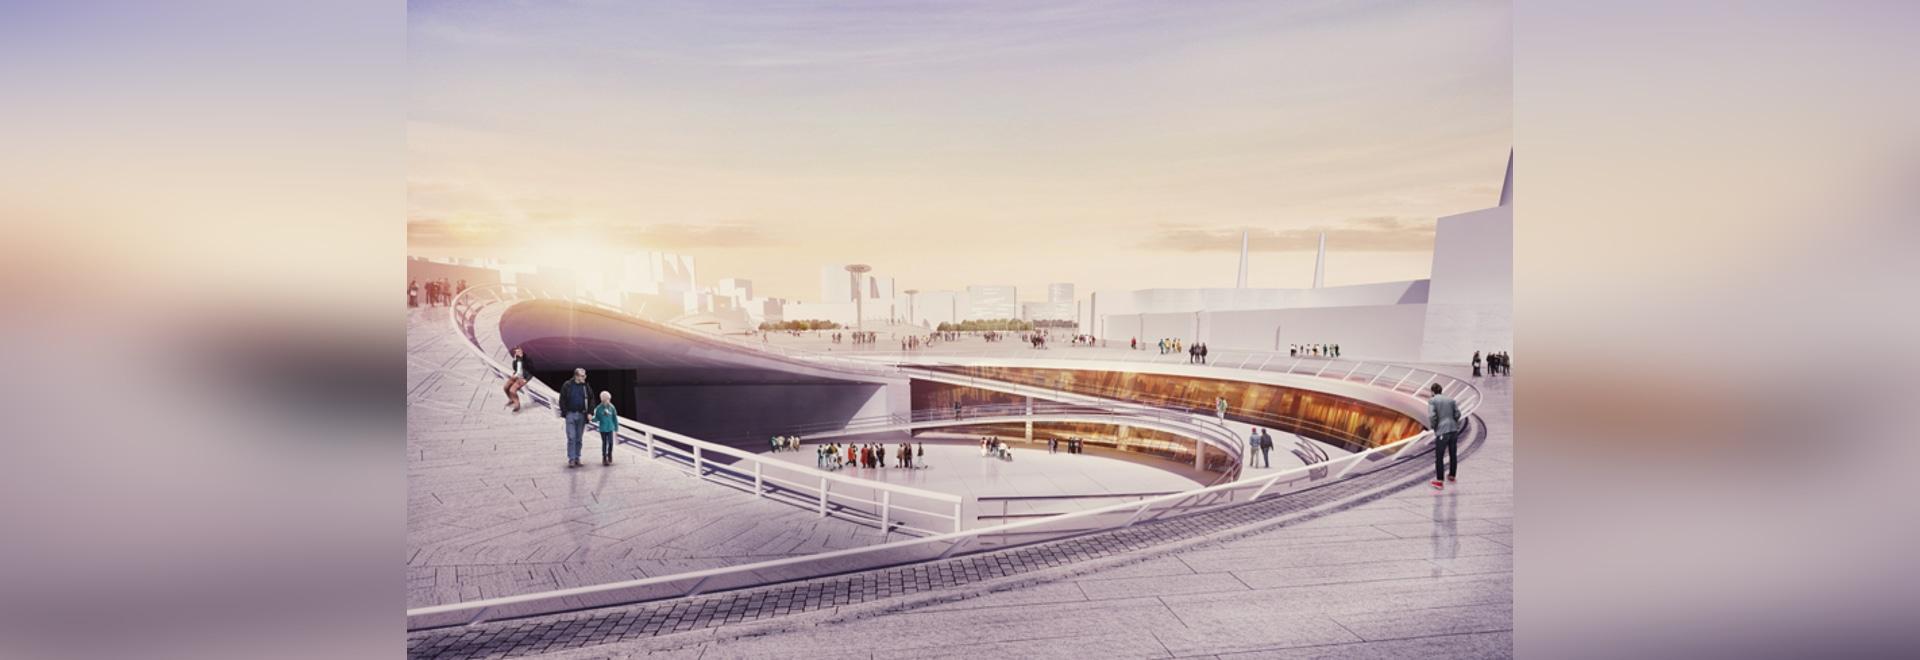 Farahmand collaborative teams' qibla plaza proposal for mashhad